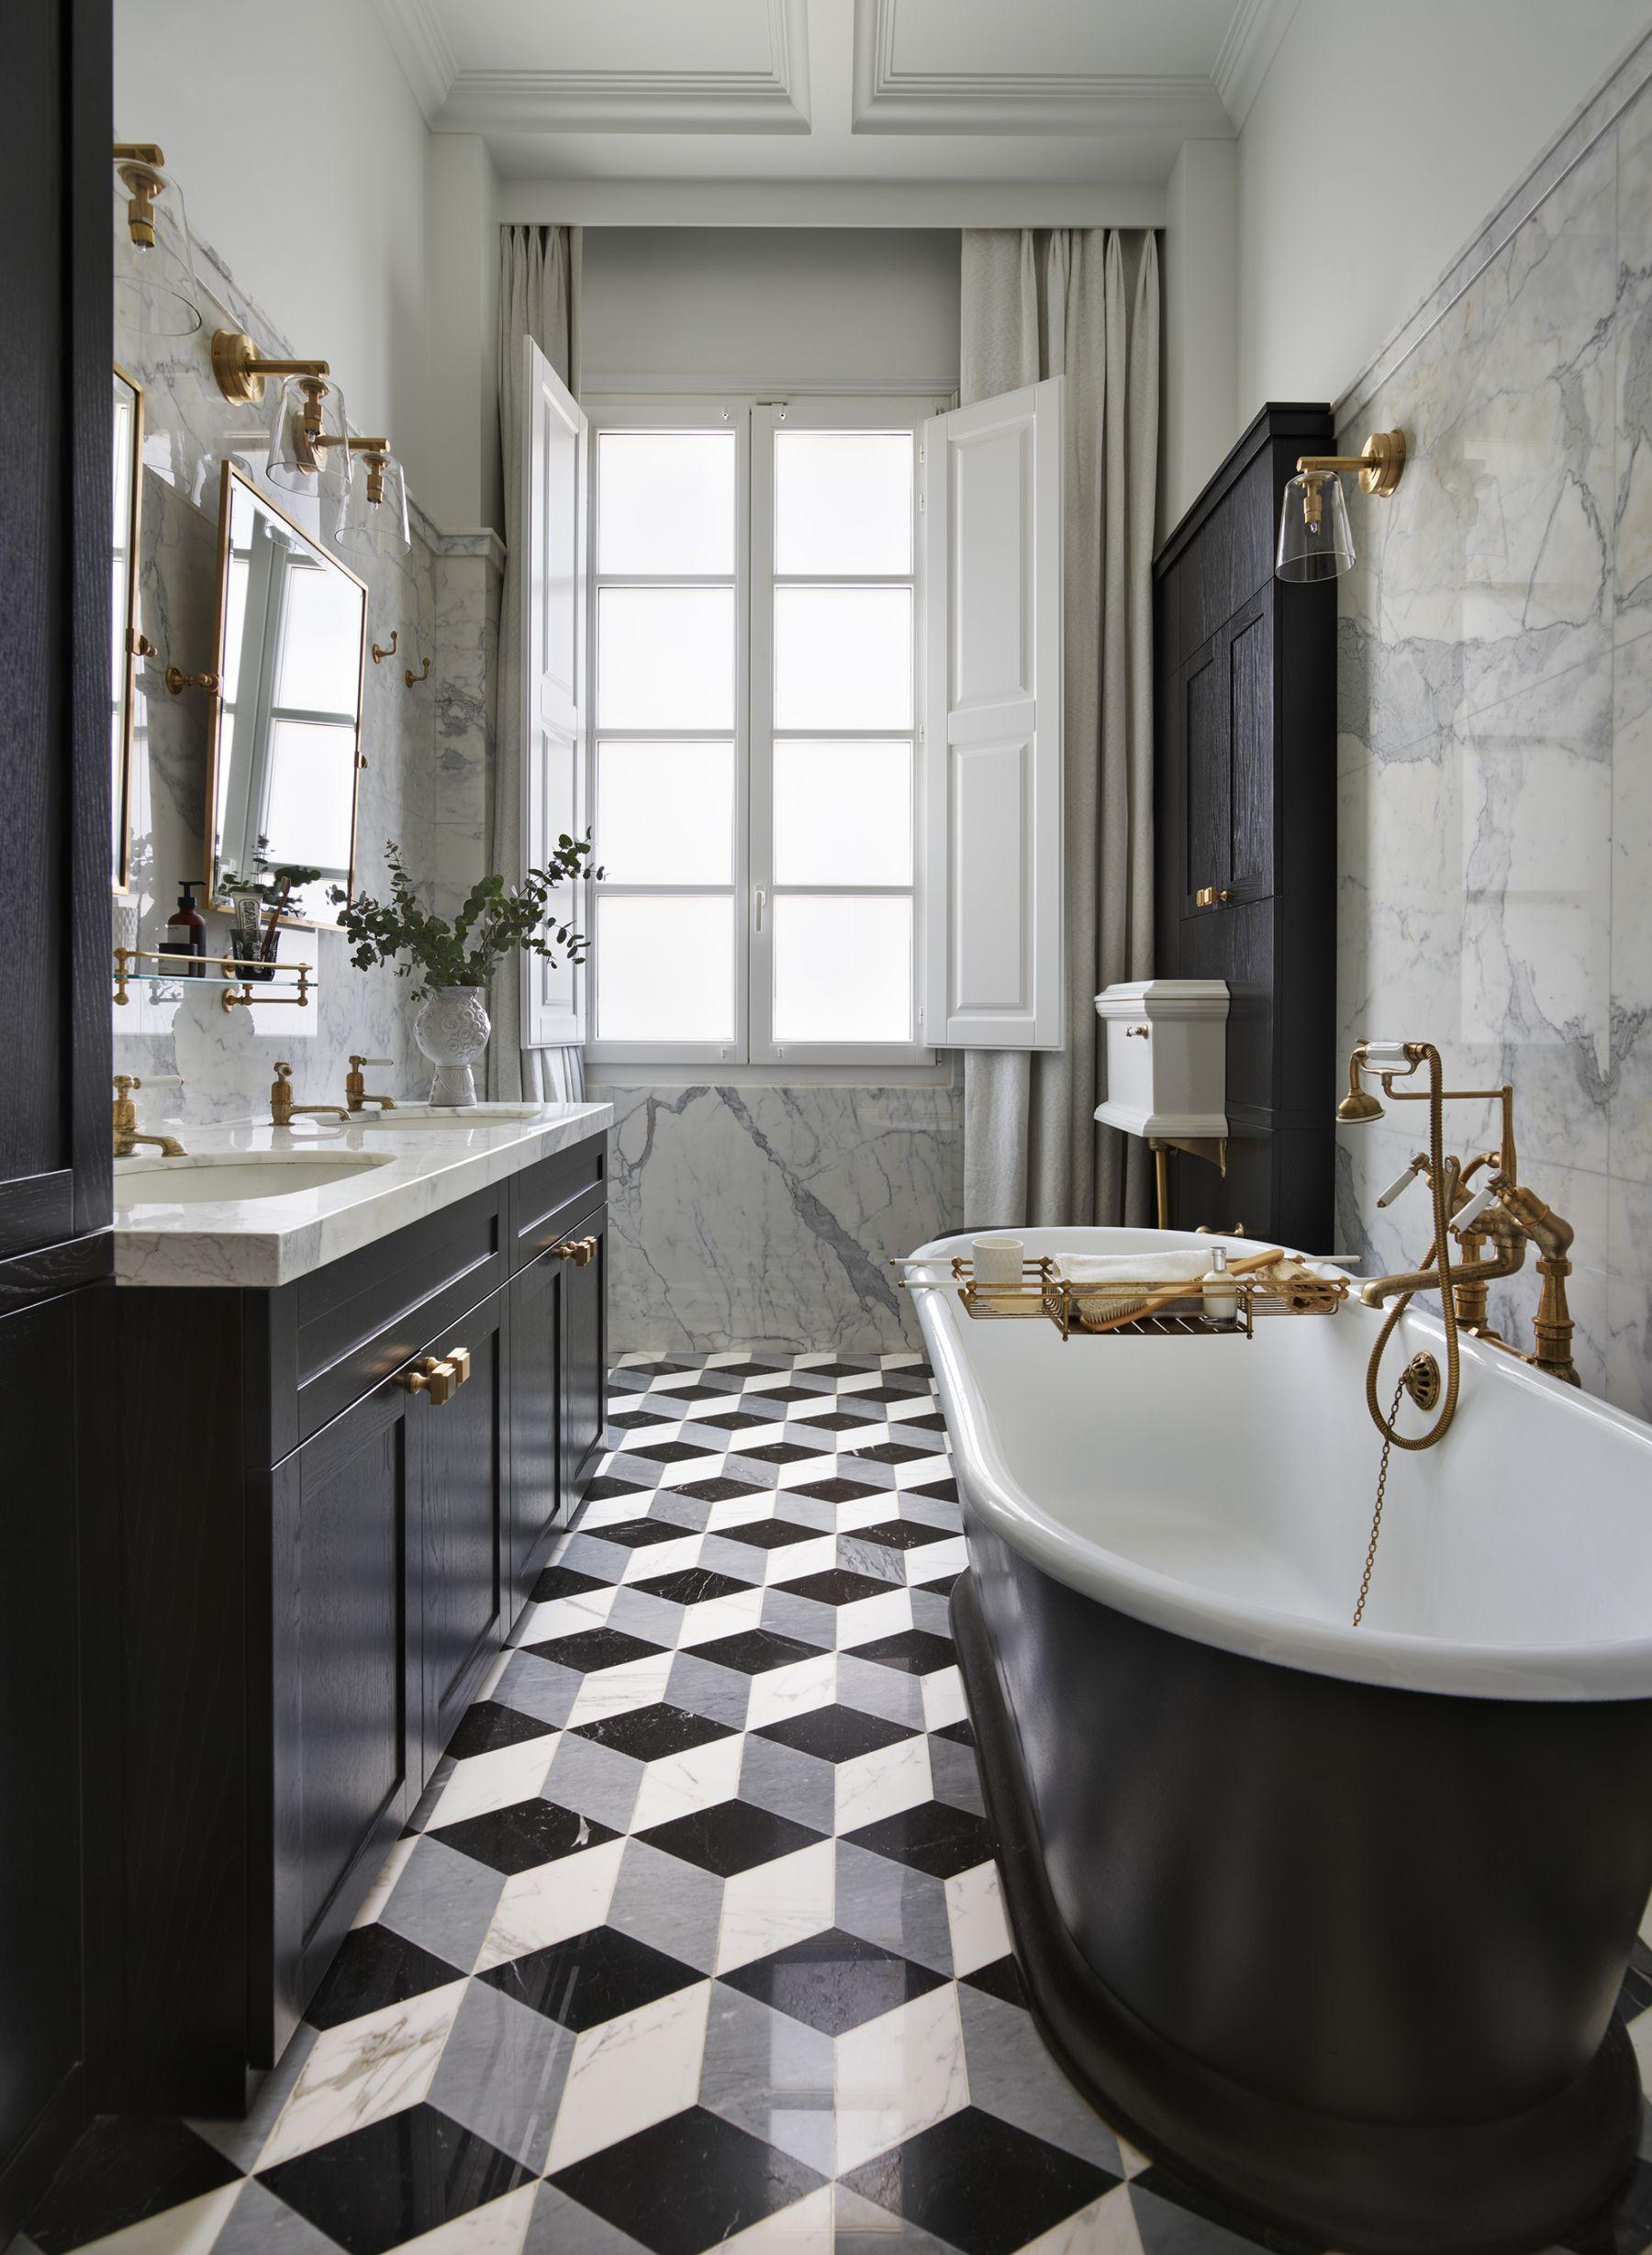 art nouveau balluta buildings in 2020 bathroom design on home inspirations this year the perfect dream bathrooms diy bathroom ideas id=49237